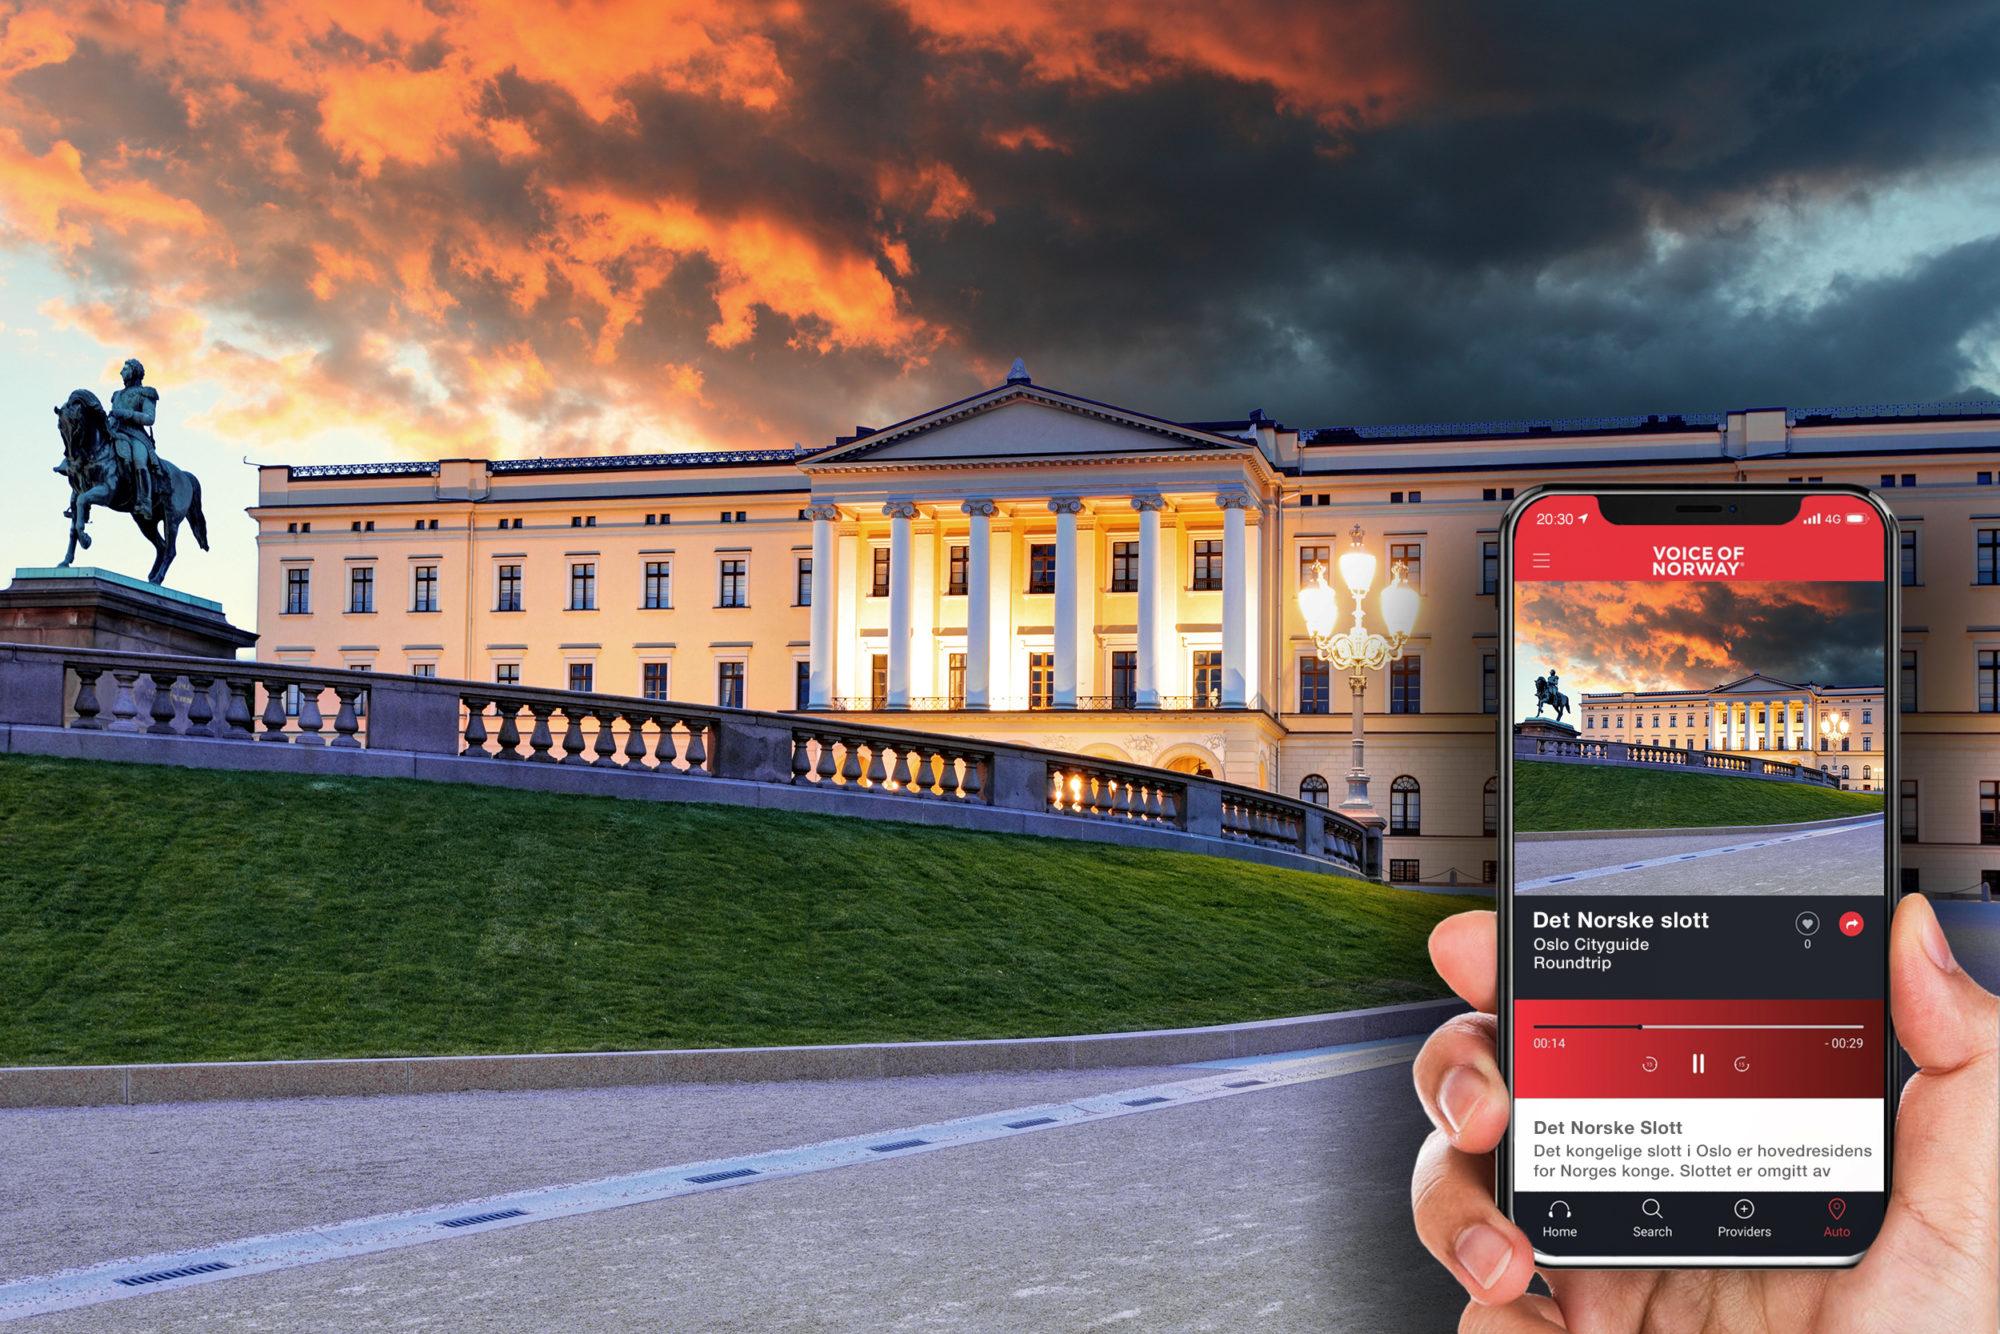 Slottet audioguide lydguide reiseguide app voice of norway turisti i norge reiseapp